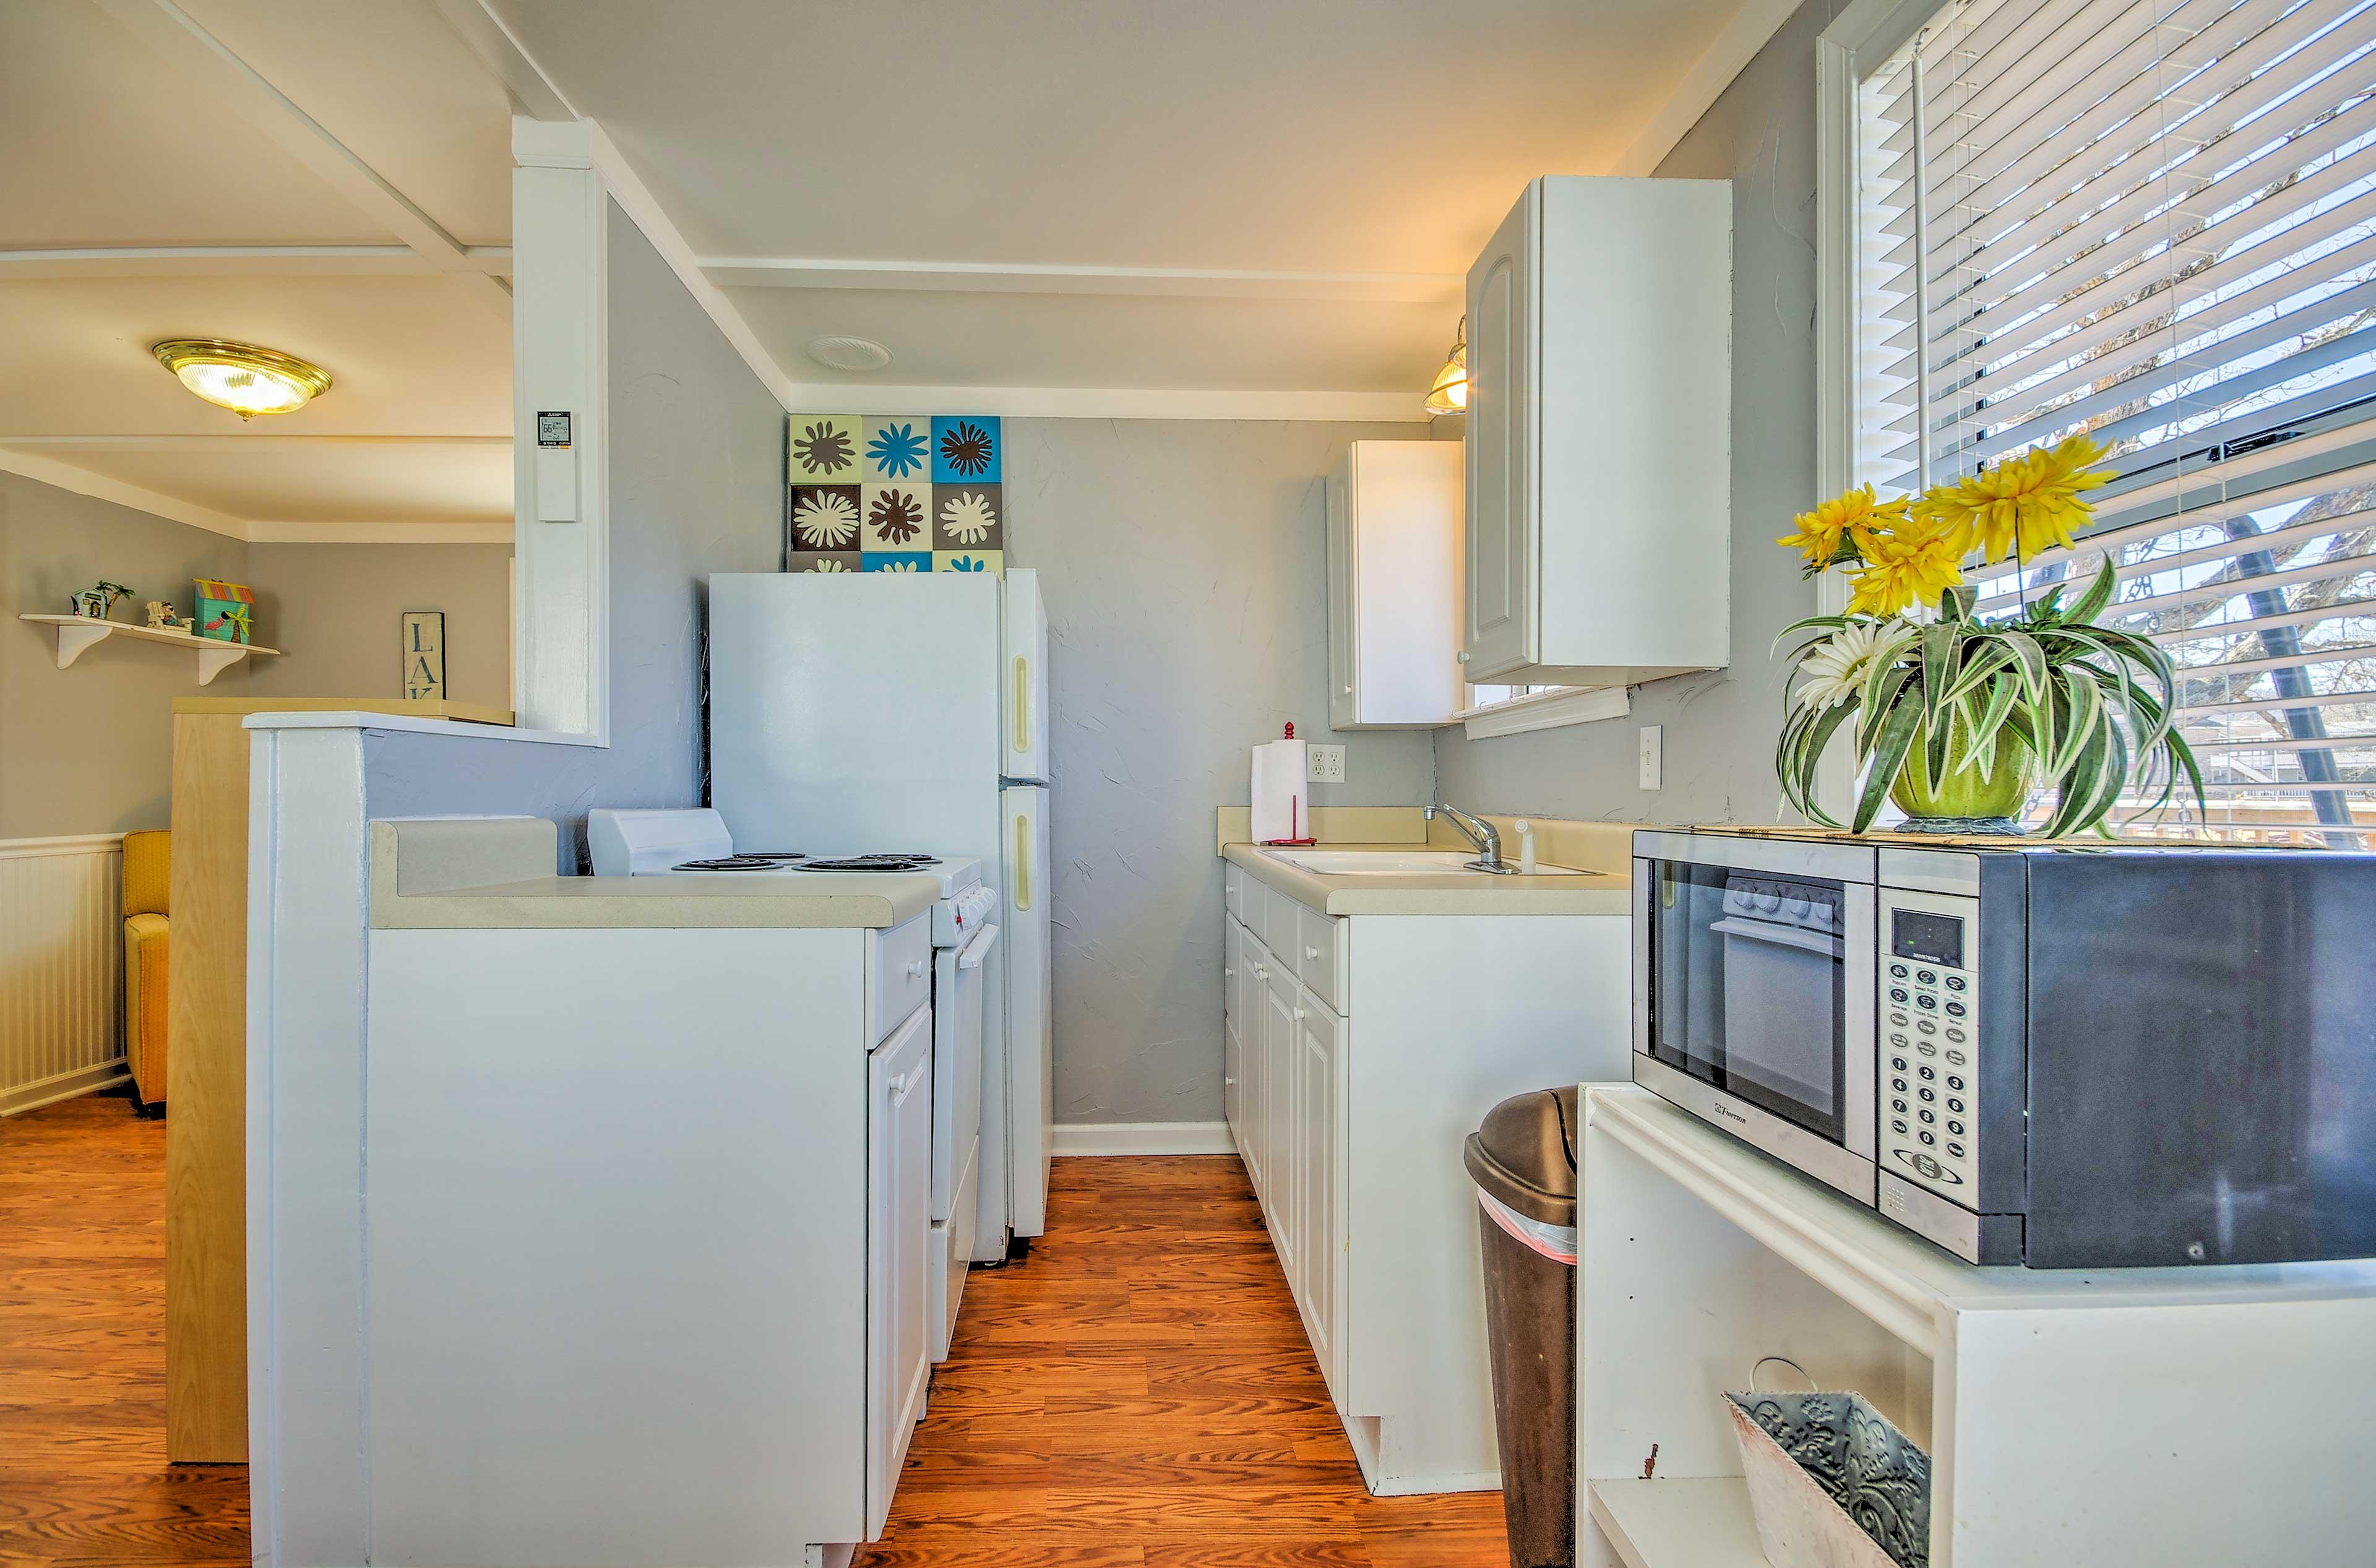 Kitchen | 4-Burner Stovetop